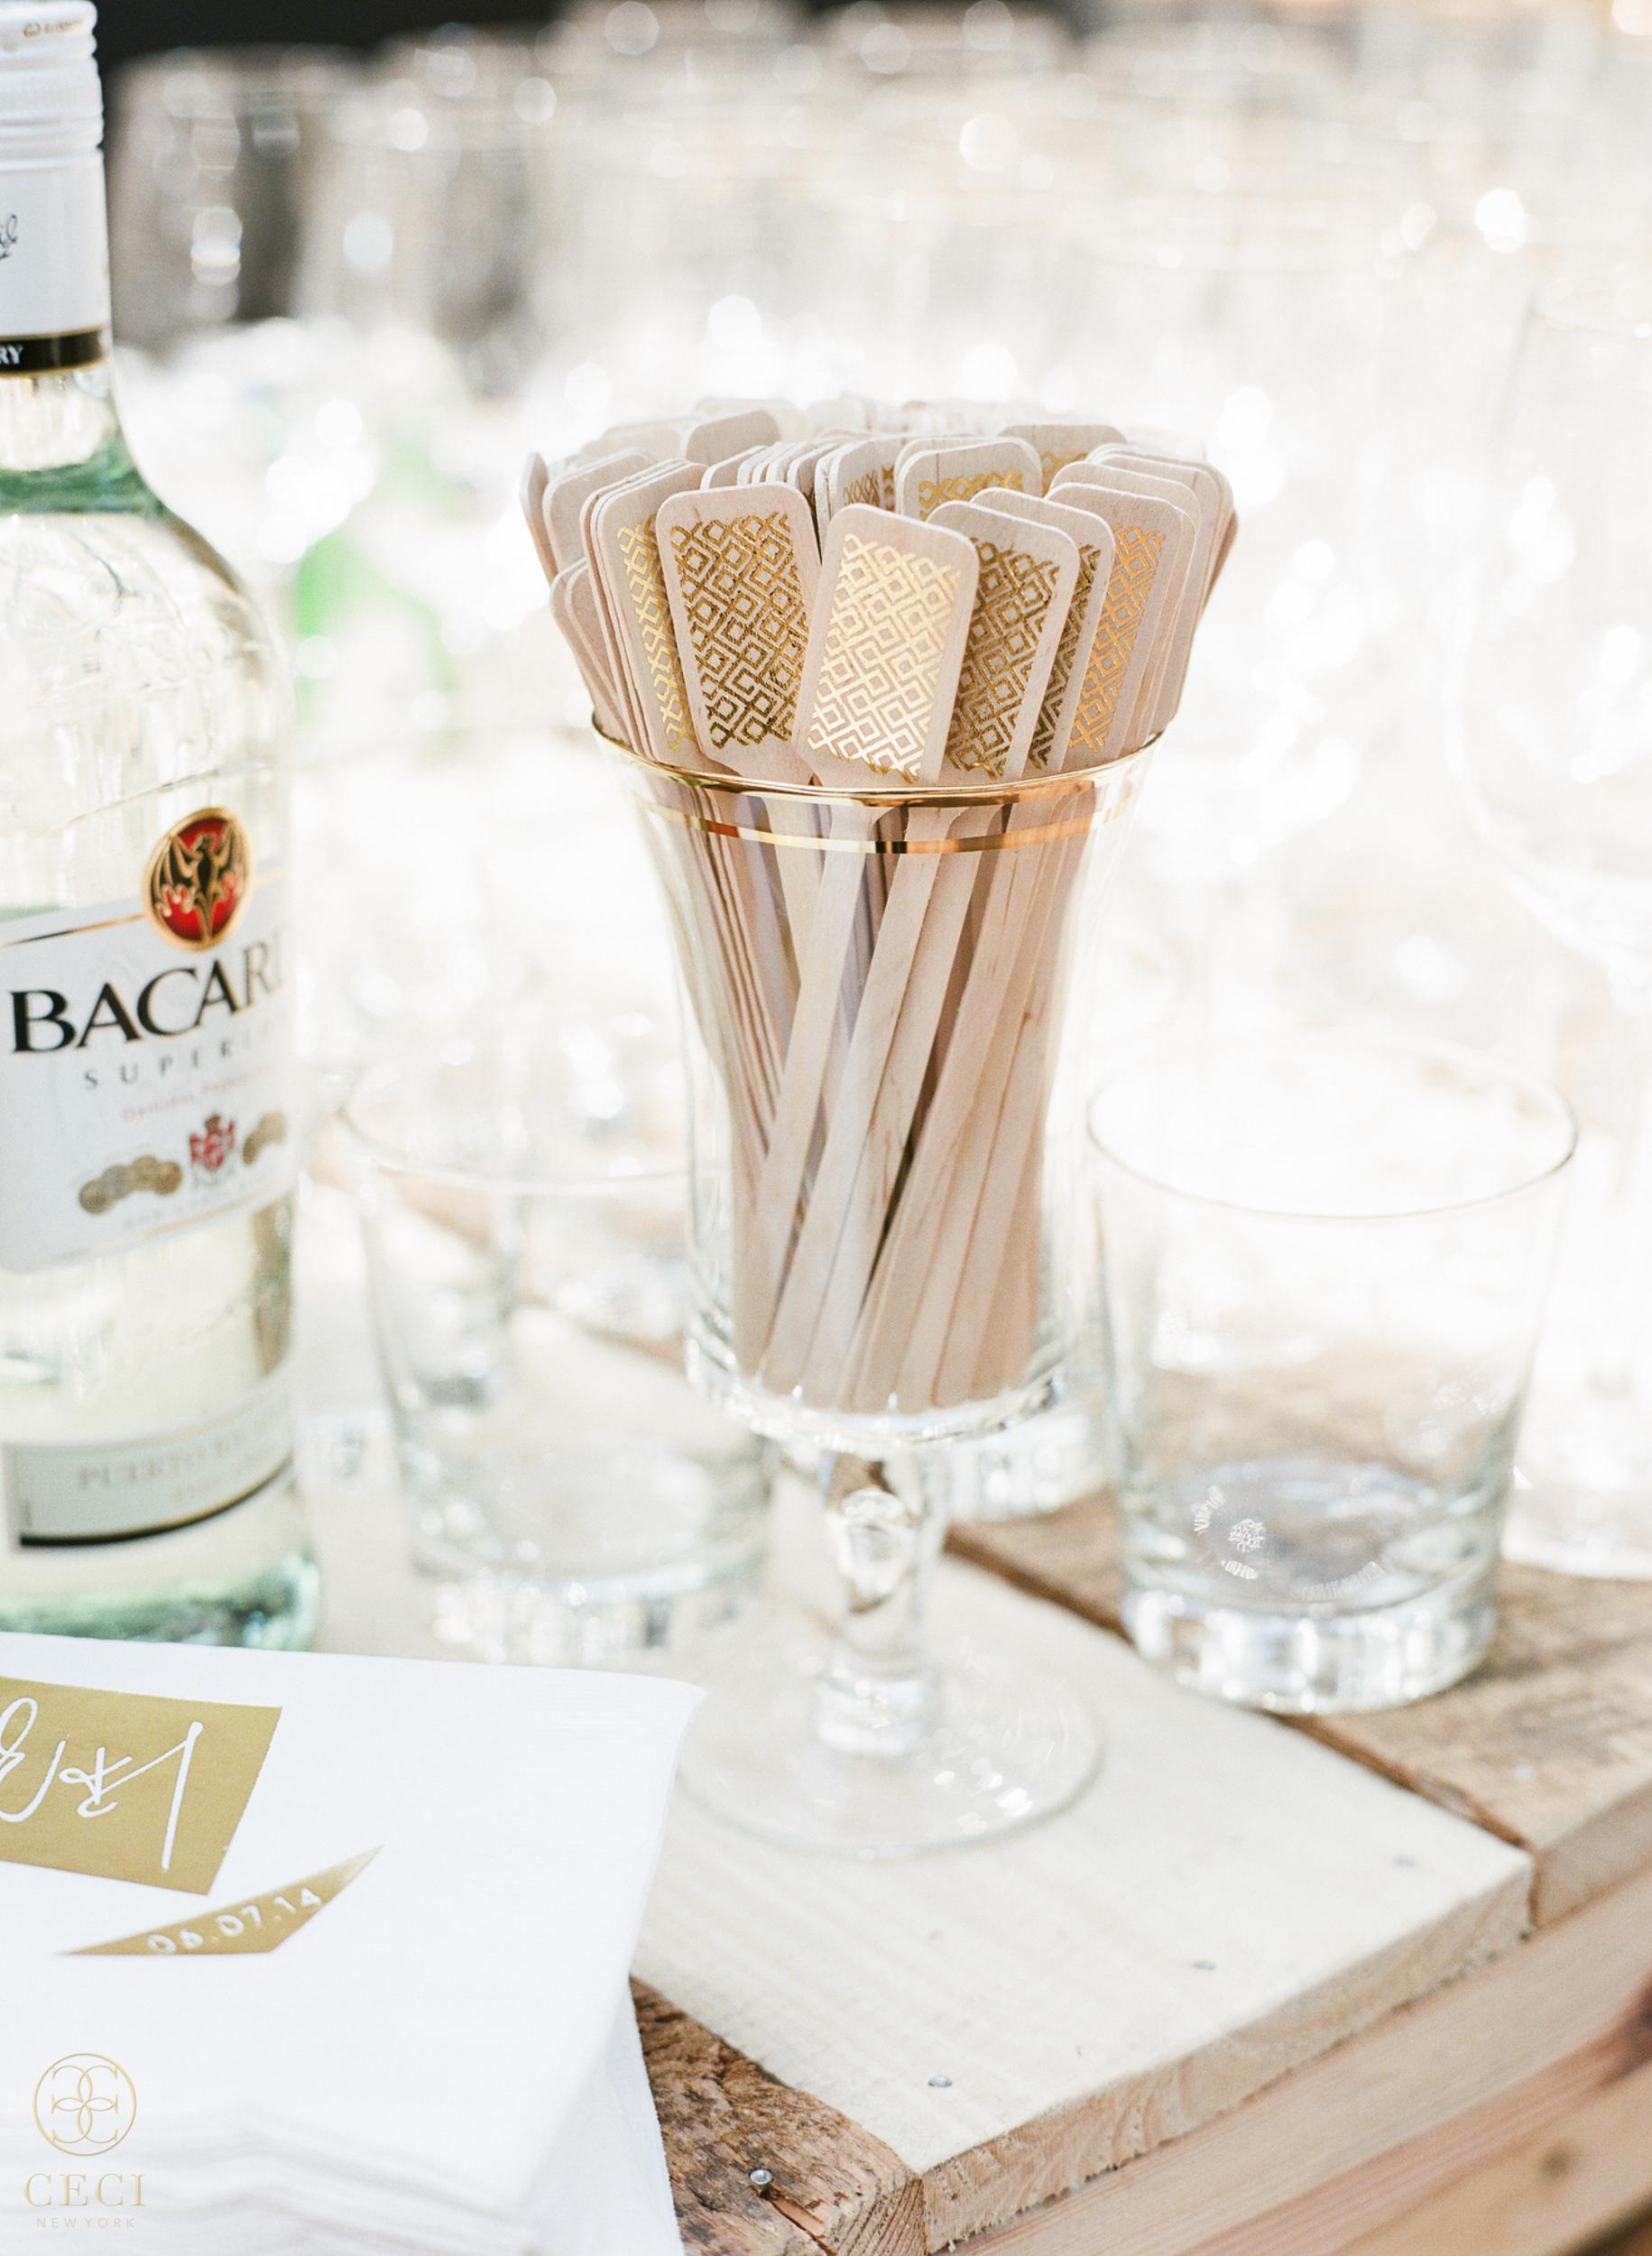 south_carolina_farm_wedding_rustic_chic_surprise_secret_luxe_wedding_bachelorette_emily_maynard_real_weddings_wedding_invitation_modern_viewfinder_3D_-2.jpg